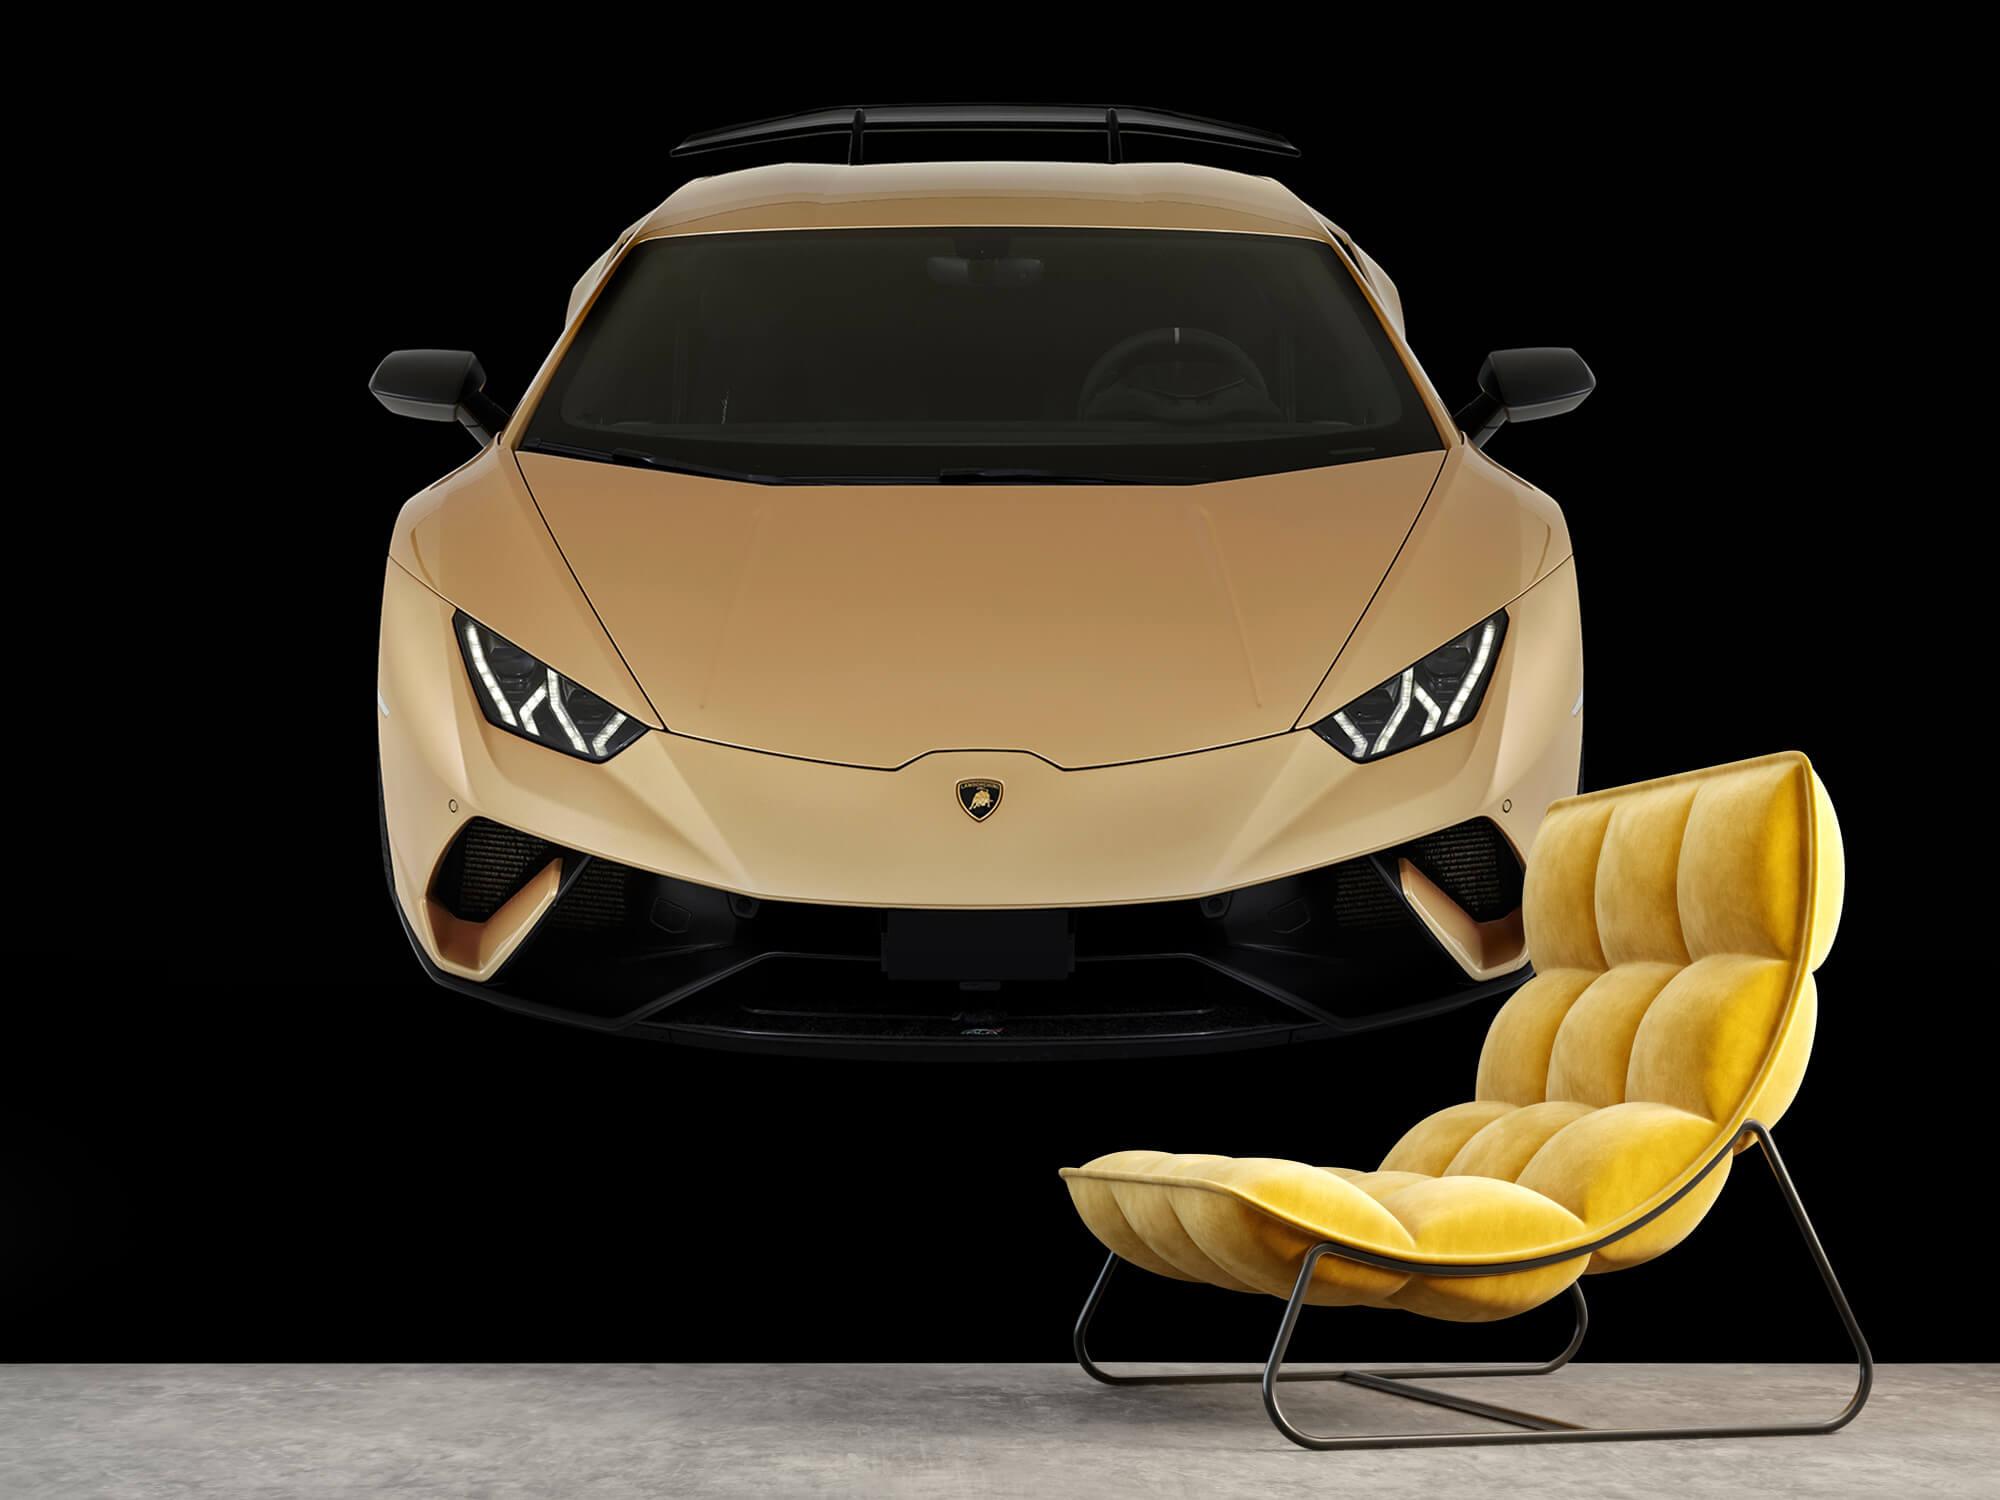 Wallpaper Lamborghini Huracán - Avant du dessus, noir 8